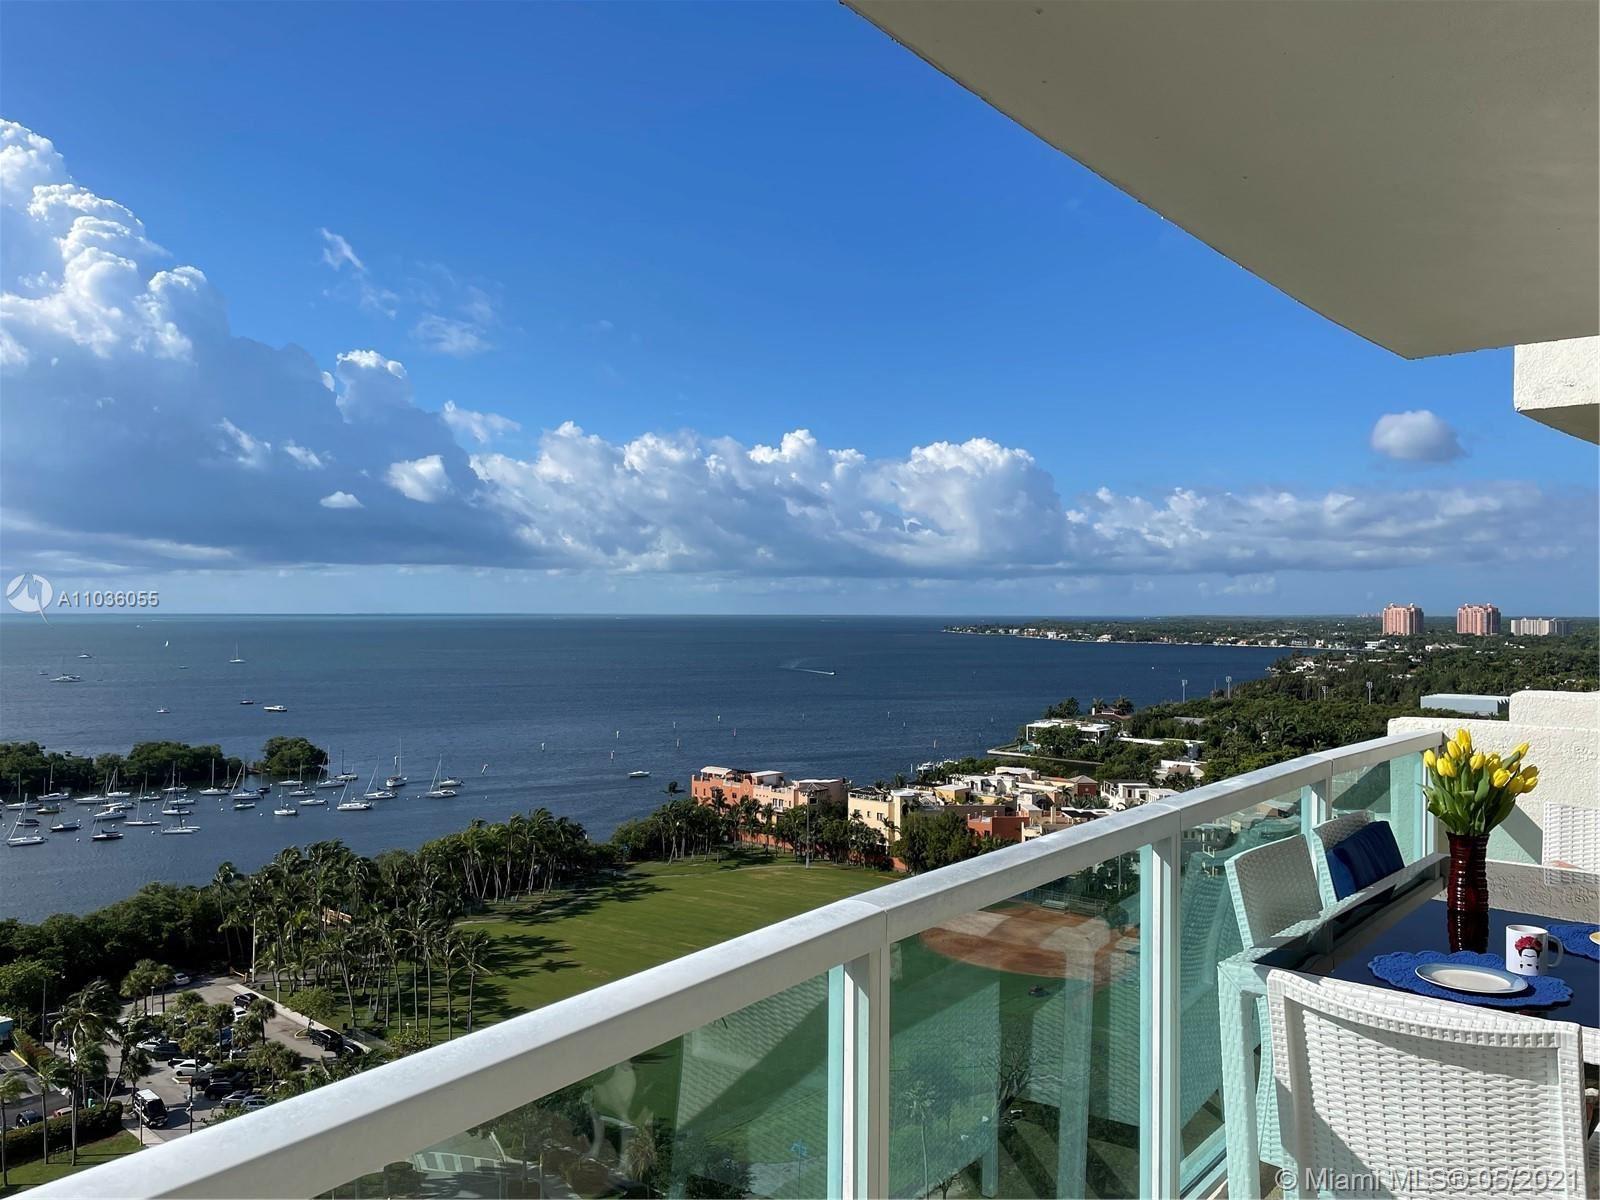 2889 Mcfarlane Rd #1801, Miami, FL 33133 - #: A11036055